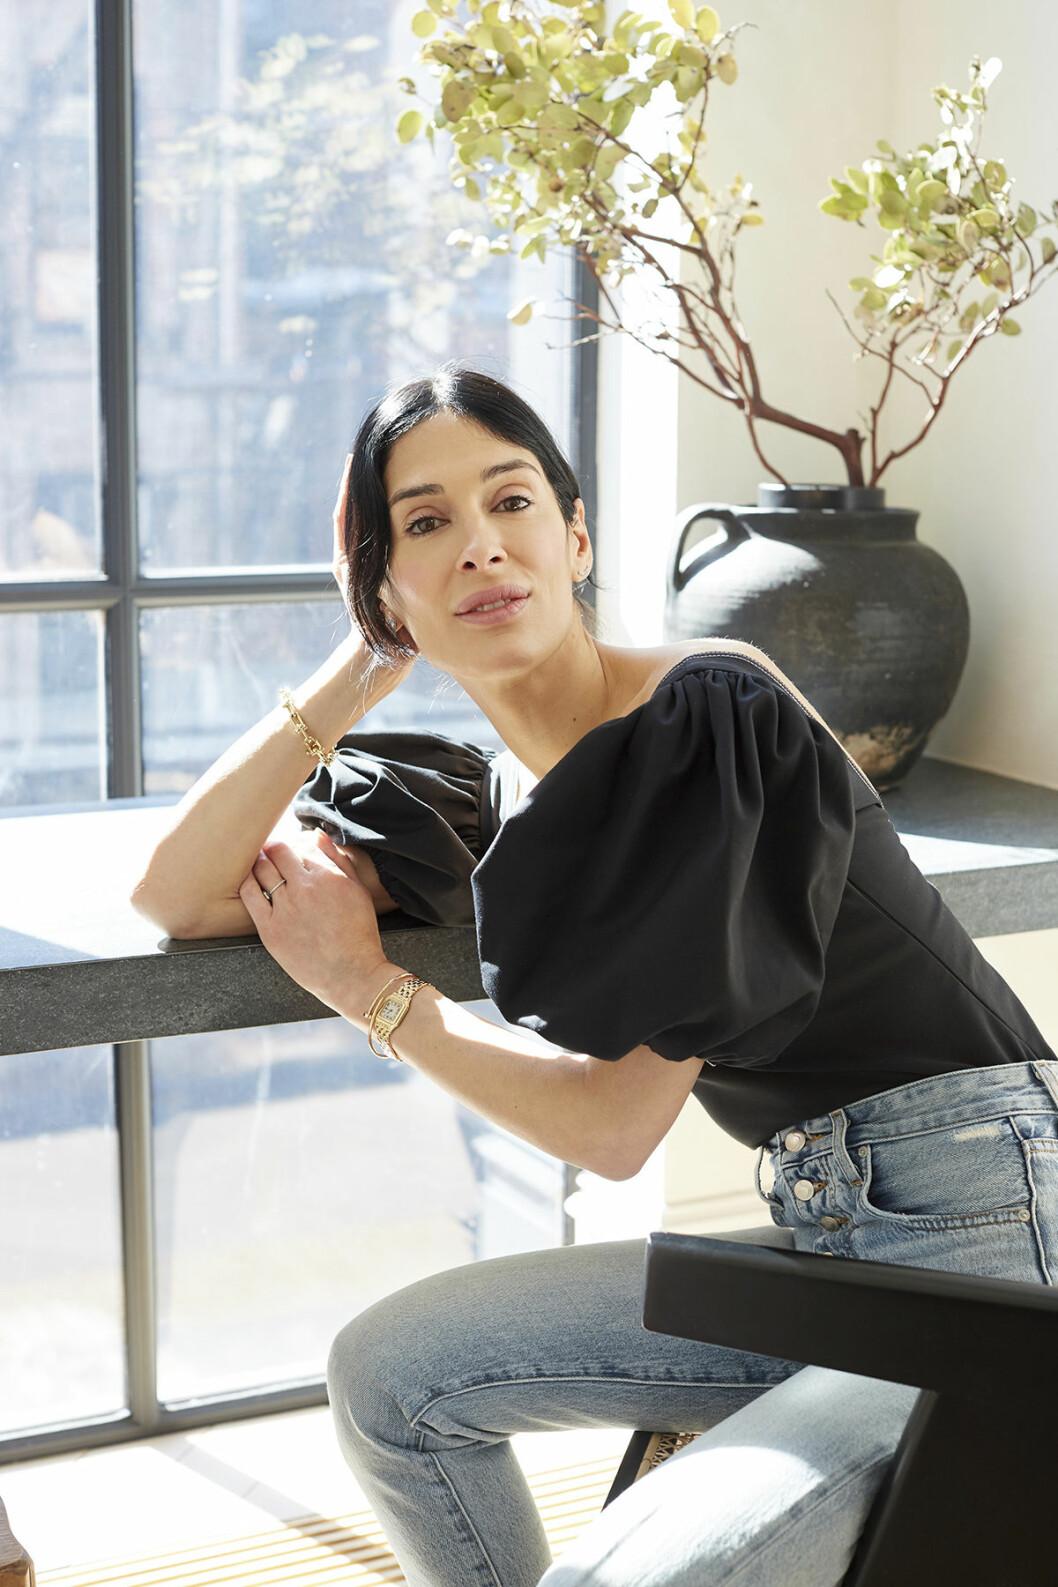 Athena Calderone inredningsdesigner